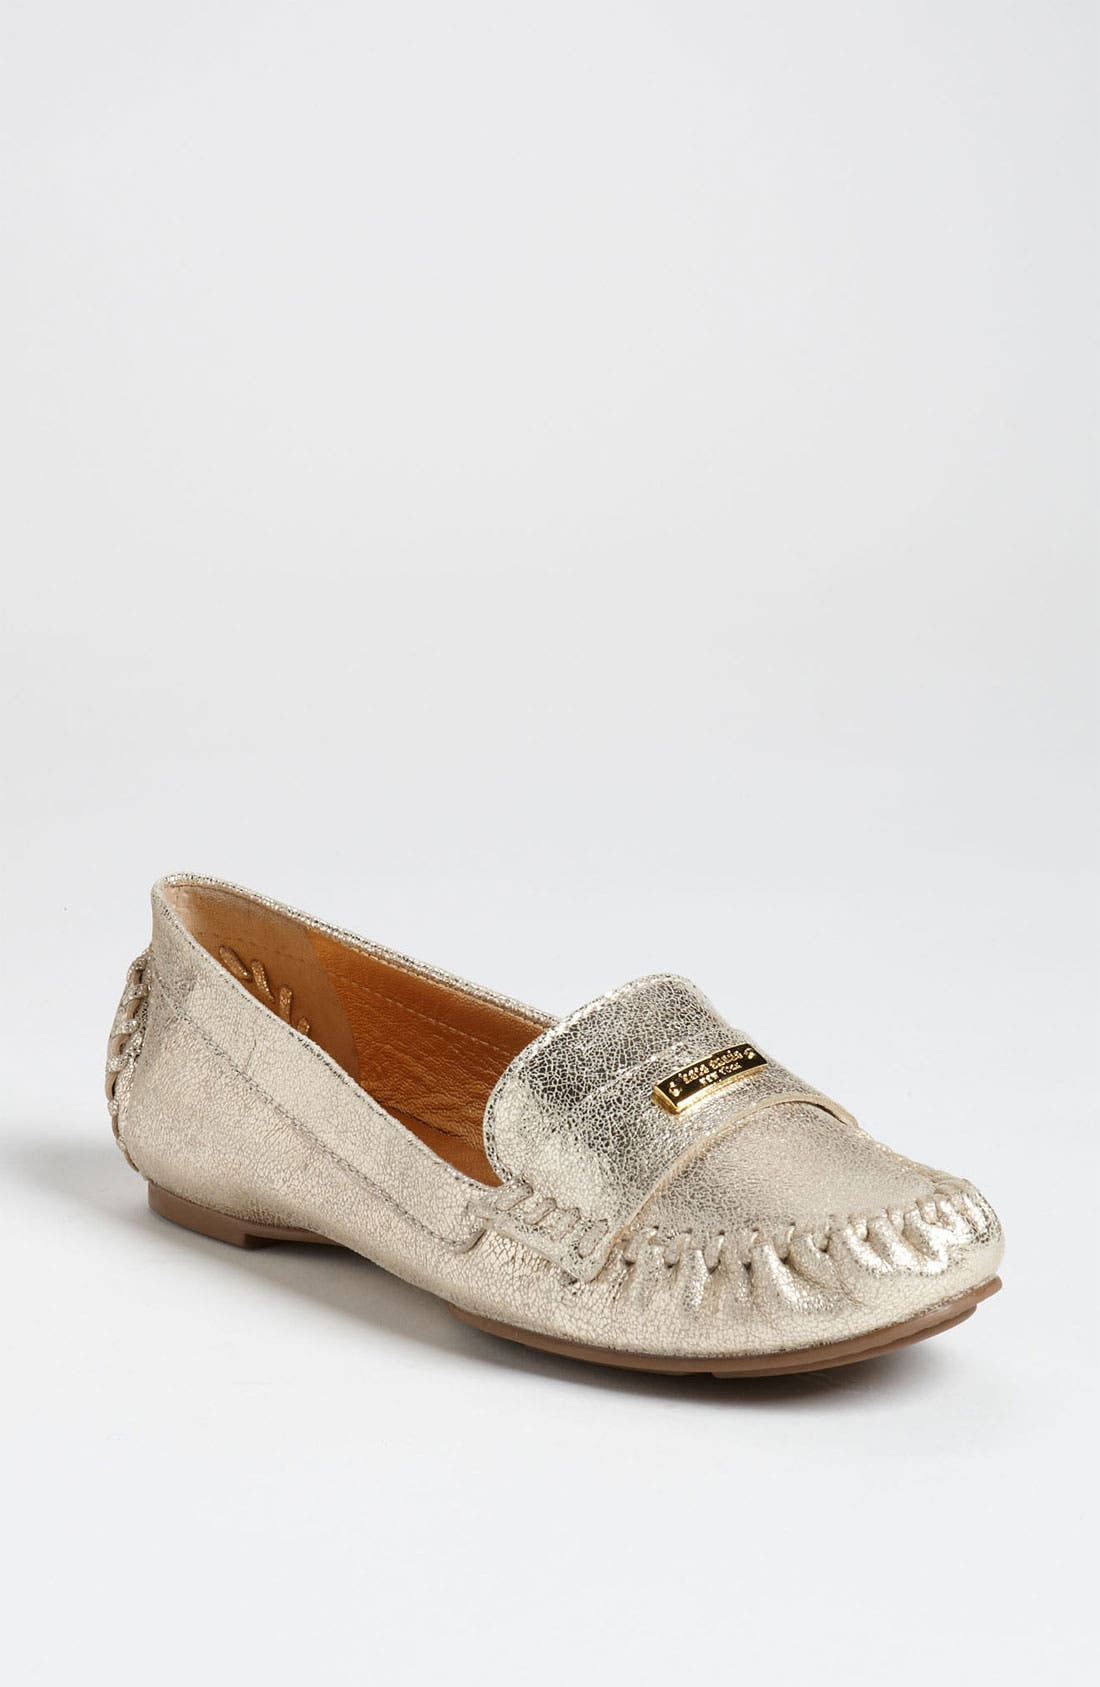 Alternate Image 1 Selected - kate spade new york 'weekend' loafer